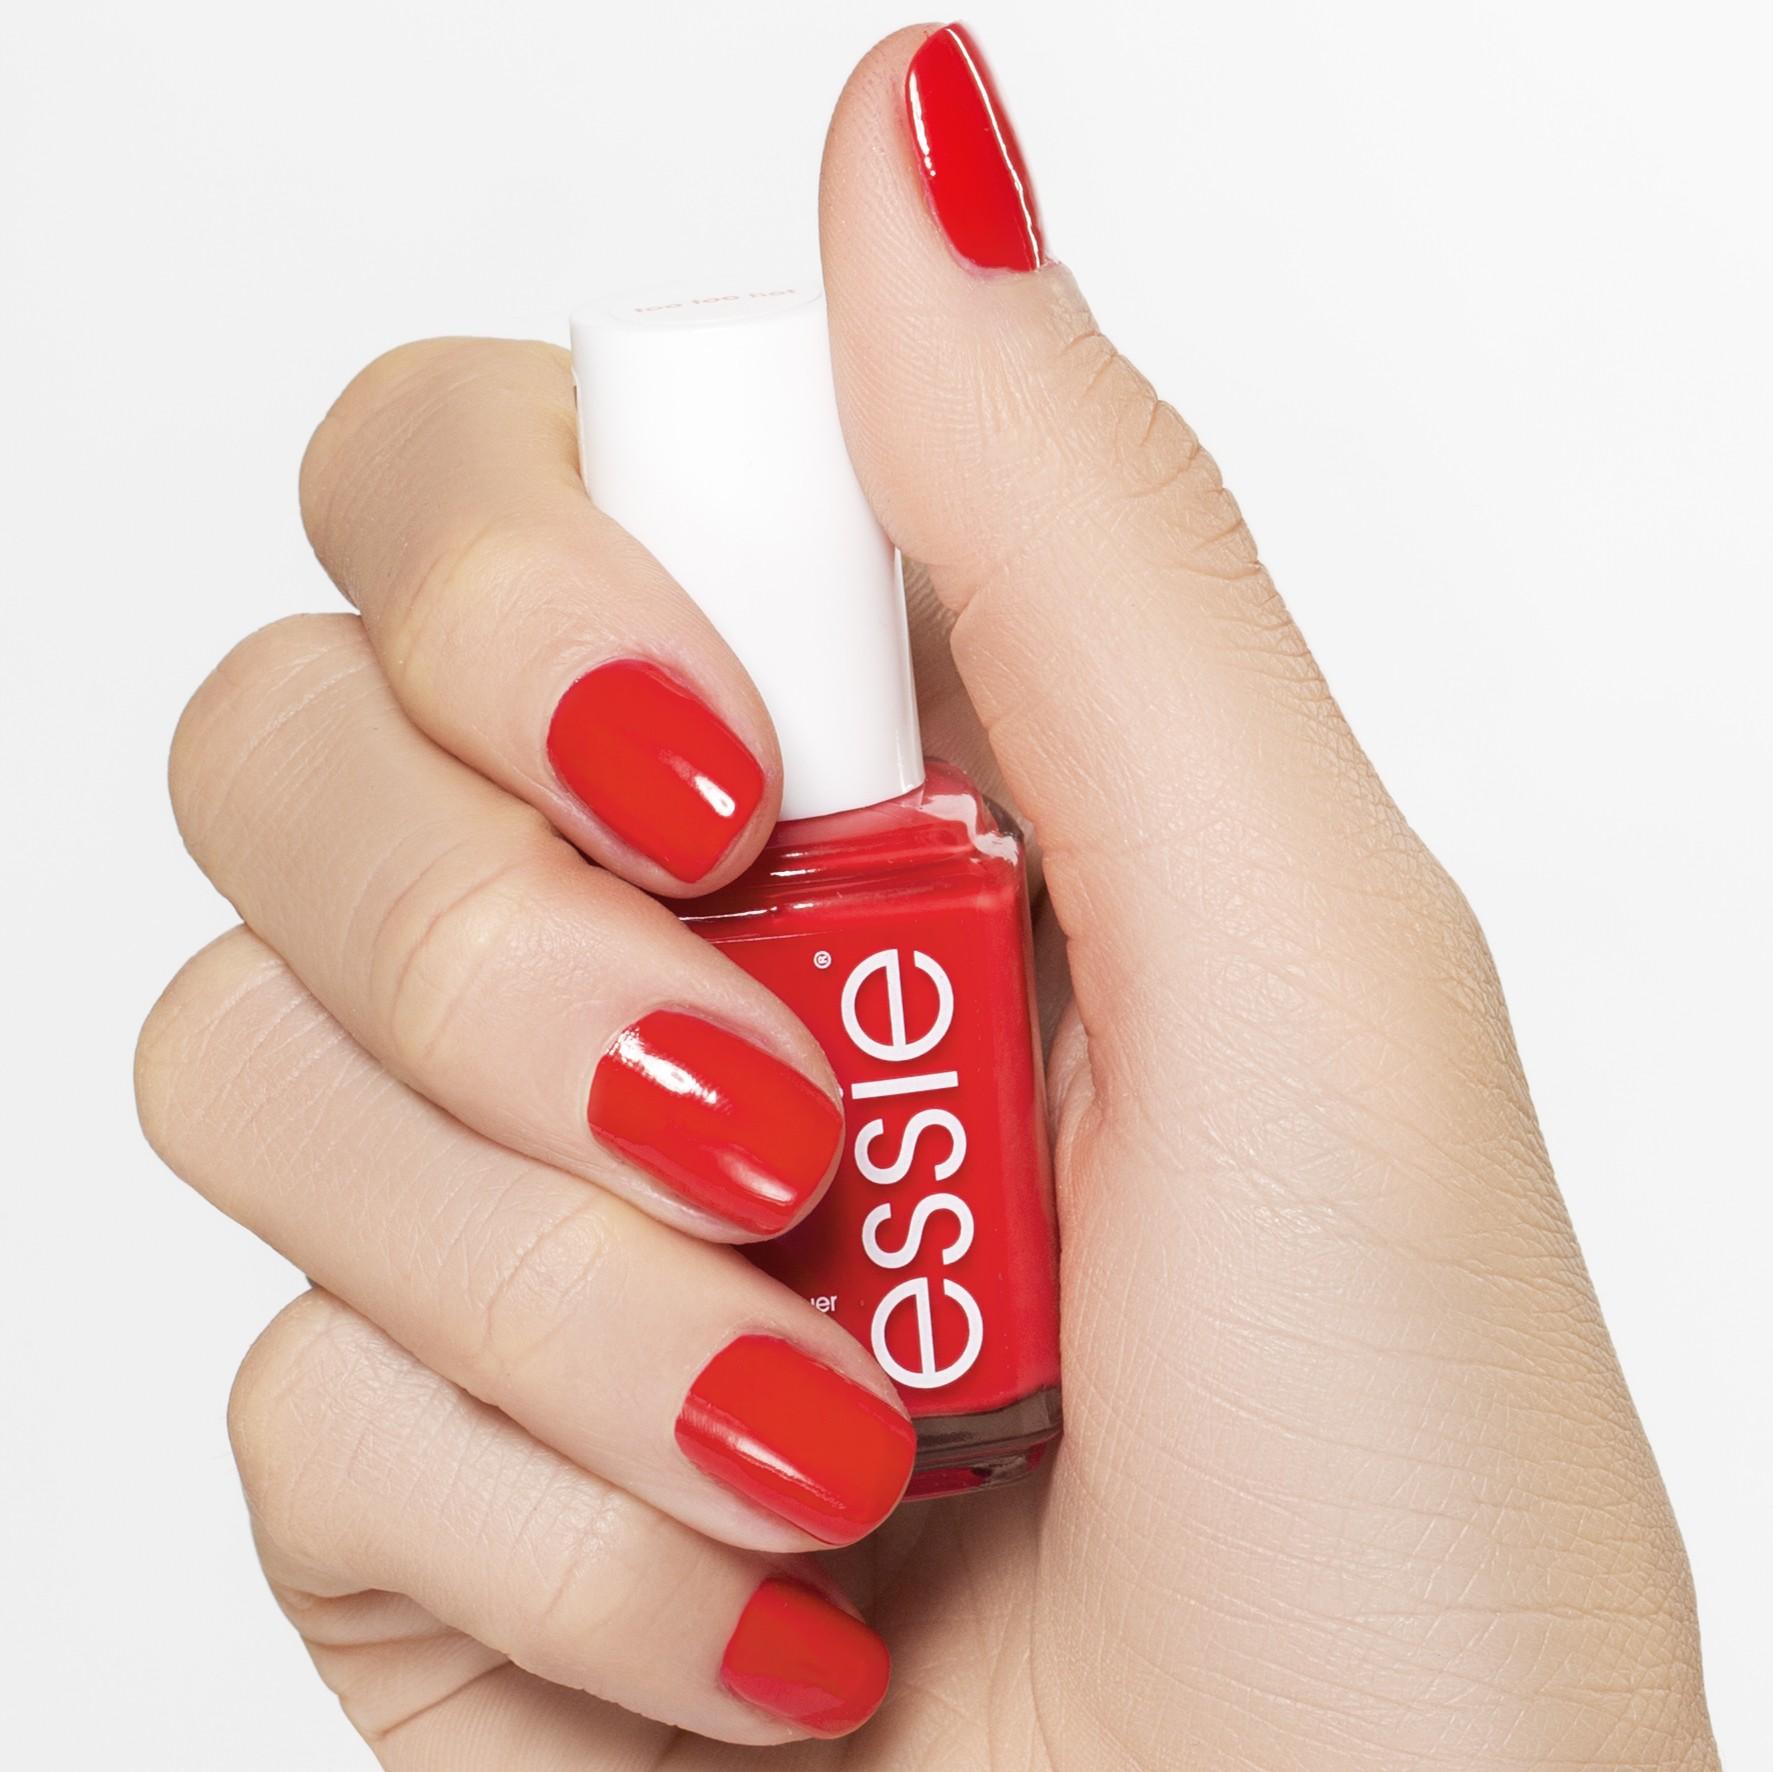 Essie лак для ногтей, оттенок 64 Пятая авеню, 13,5 мл